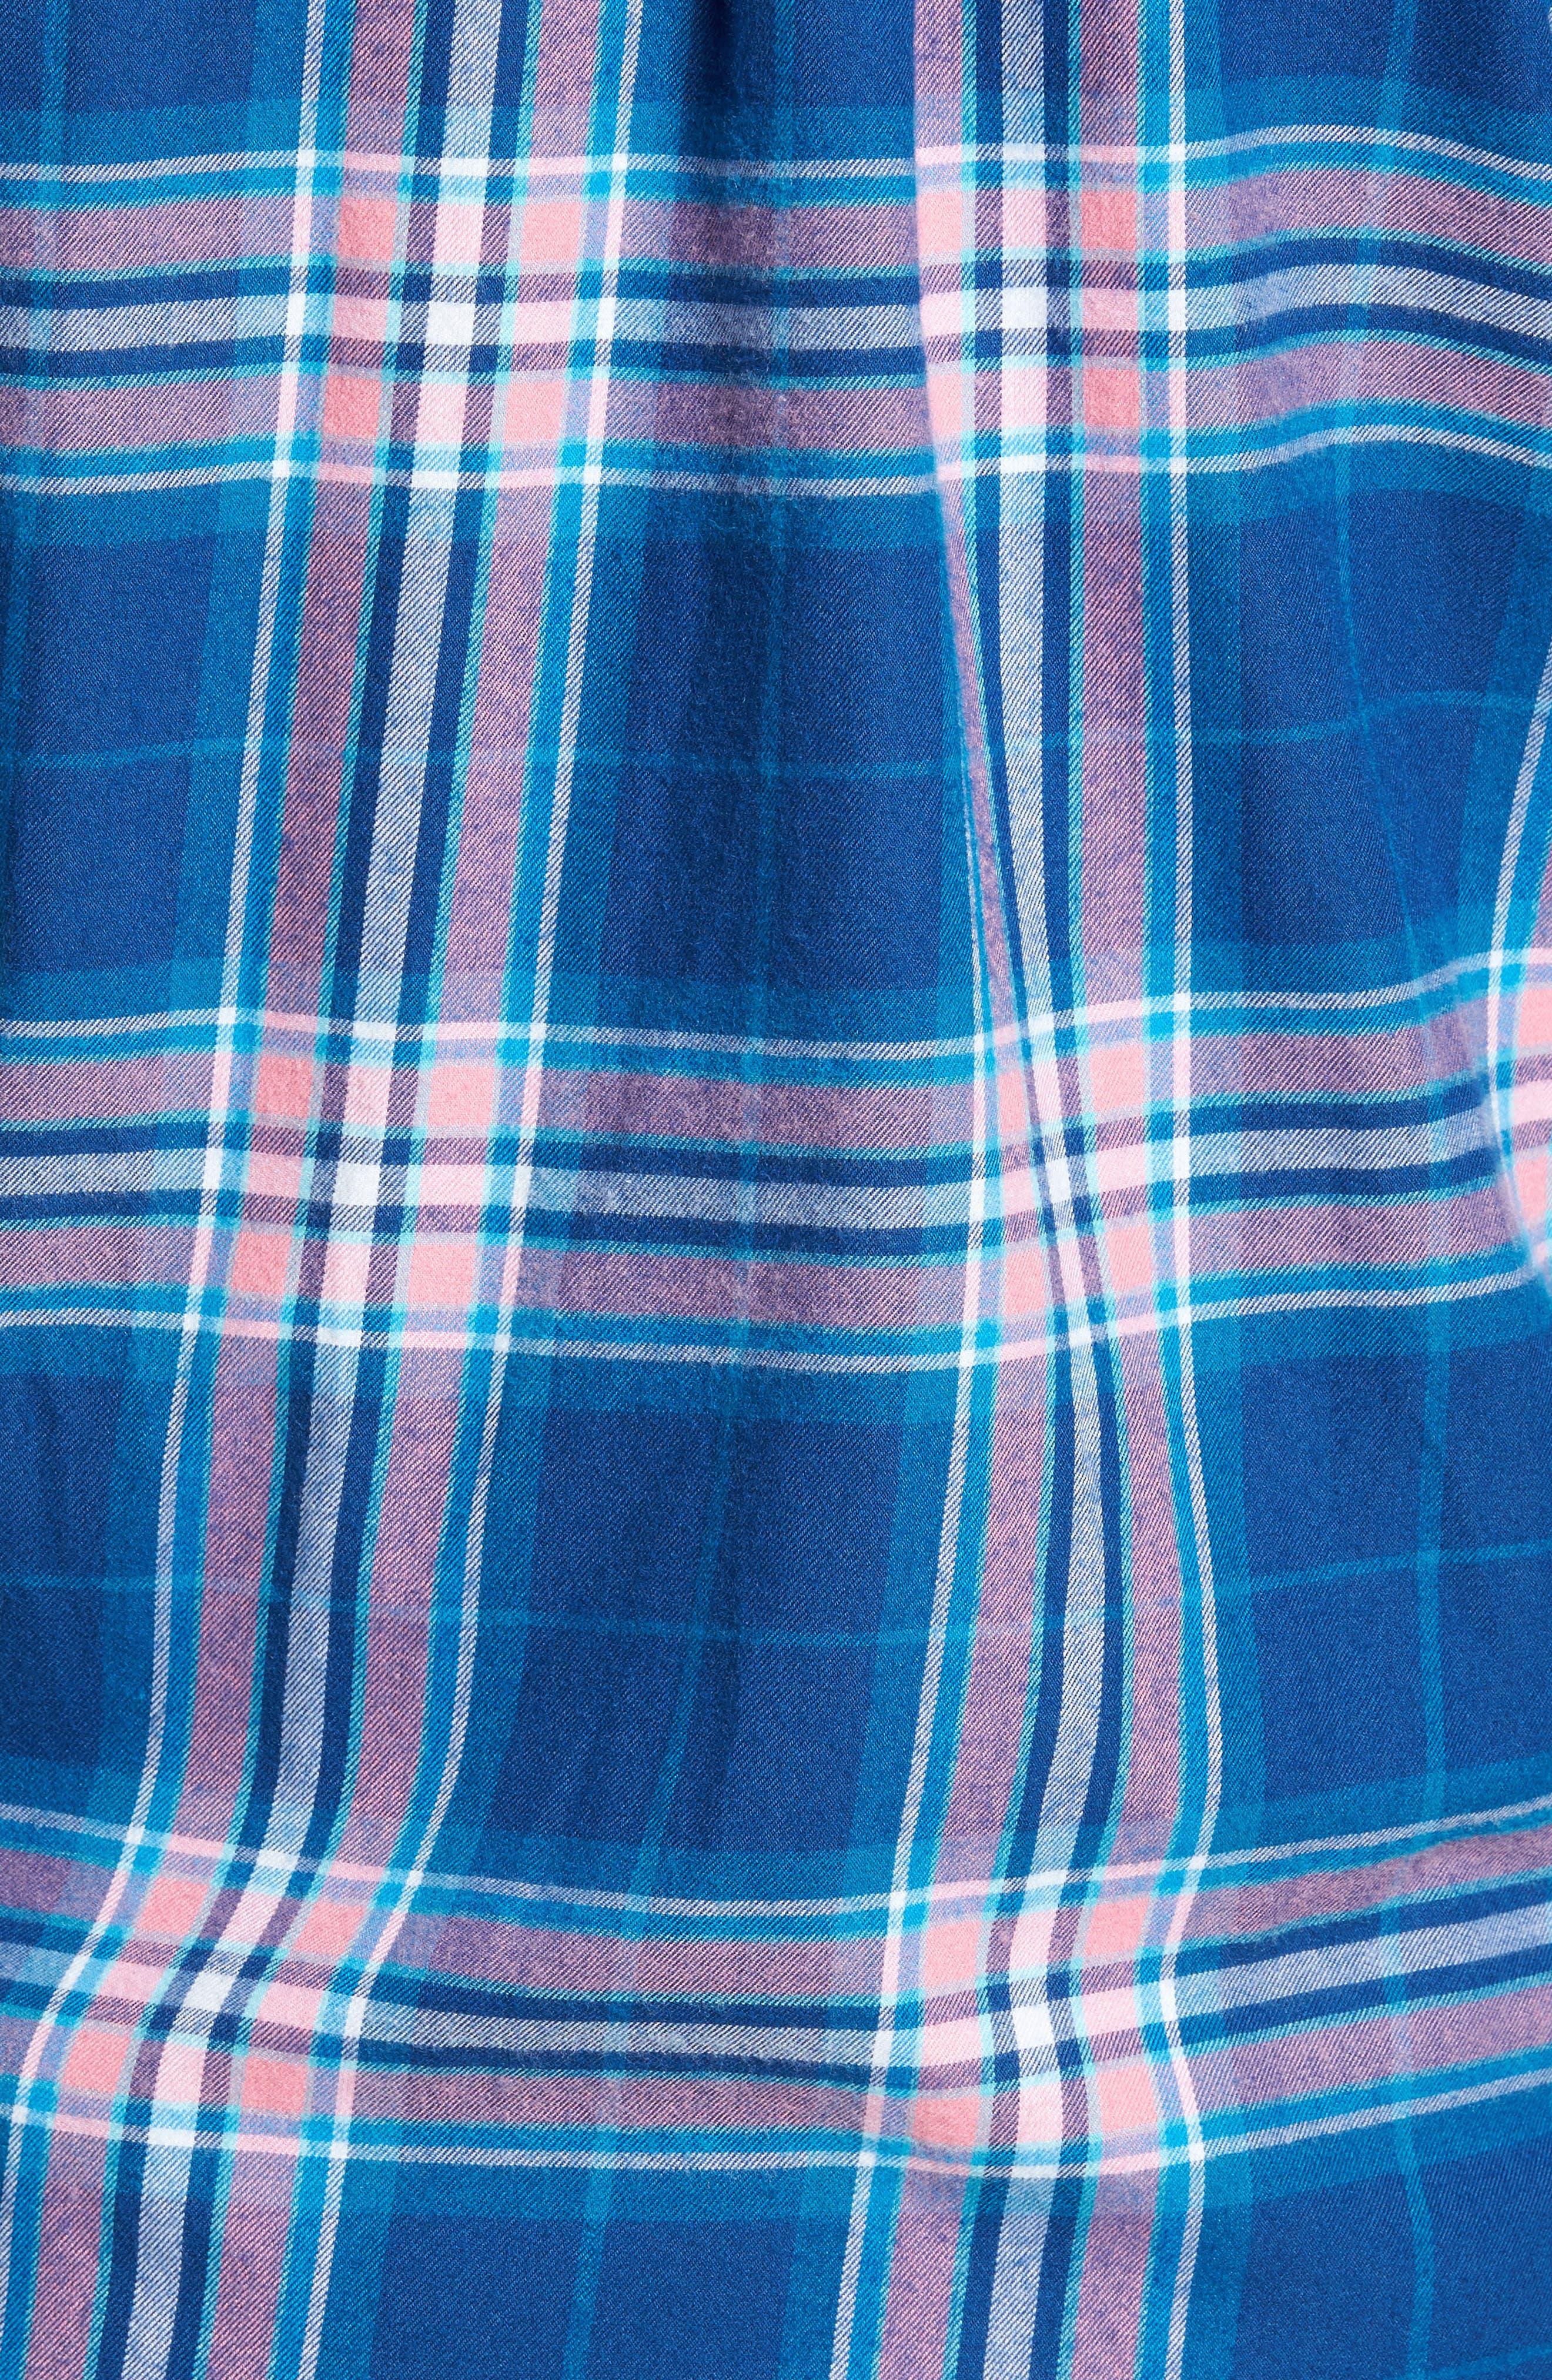 Murray Classic Fit Point Lobos Plaid Flannel Sport Shirt,                             Alternate thumbnail 5, color,                             456